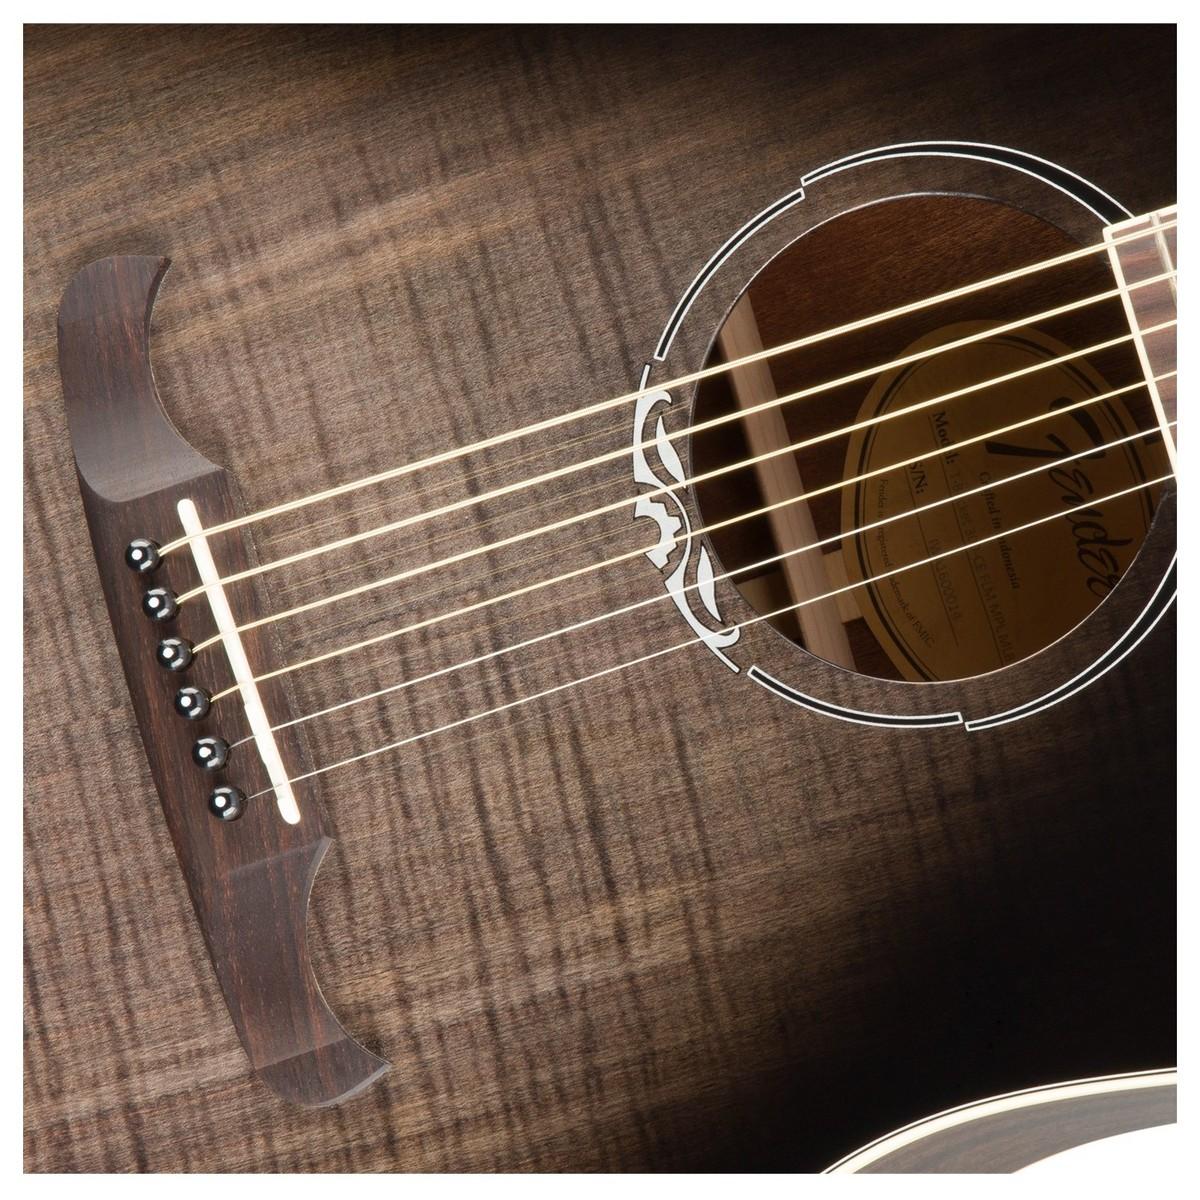 T Bucket Front Fenders : Fender t bucket ce electro acoustic guitar moonlight